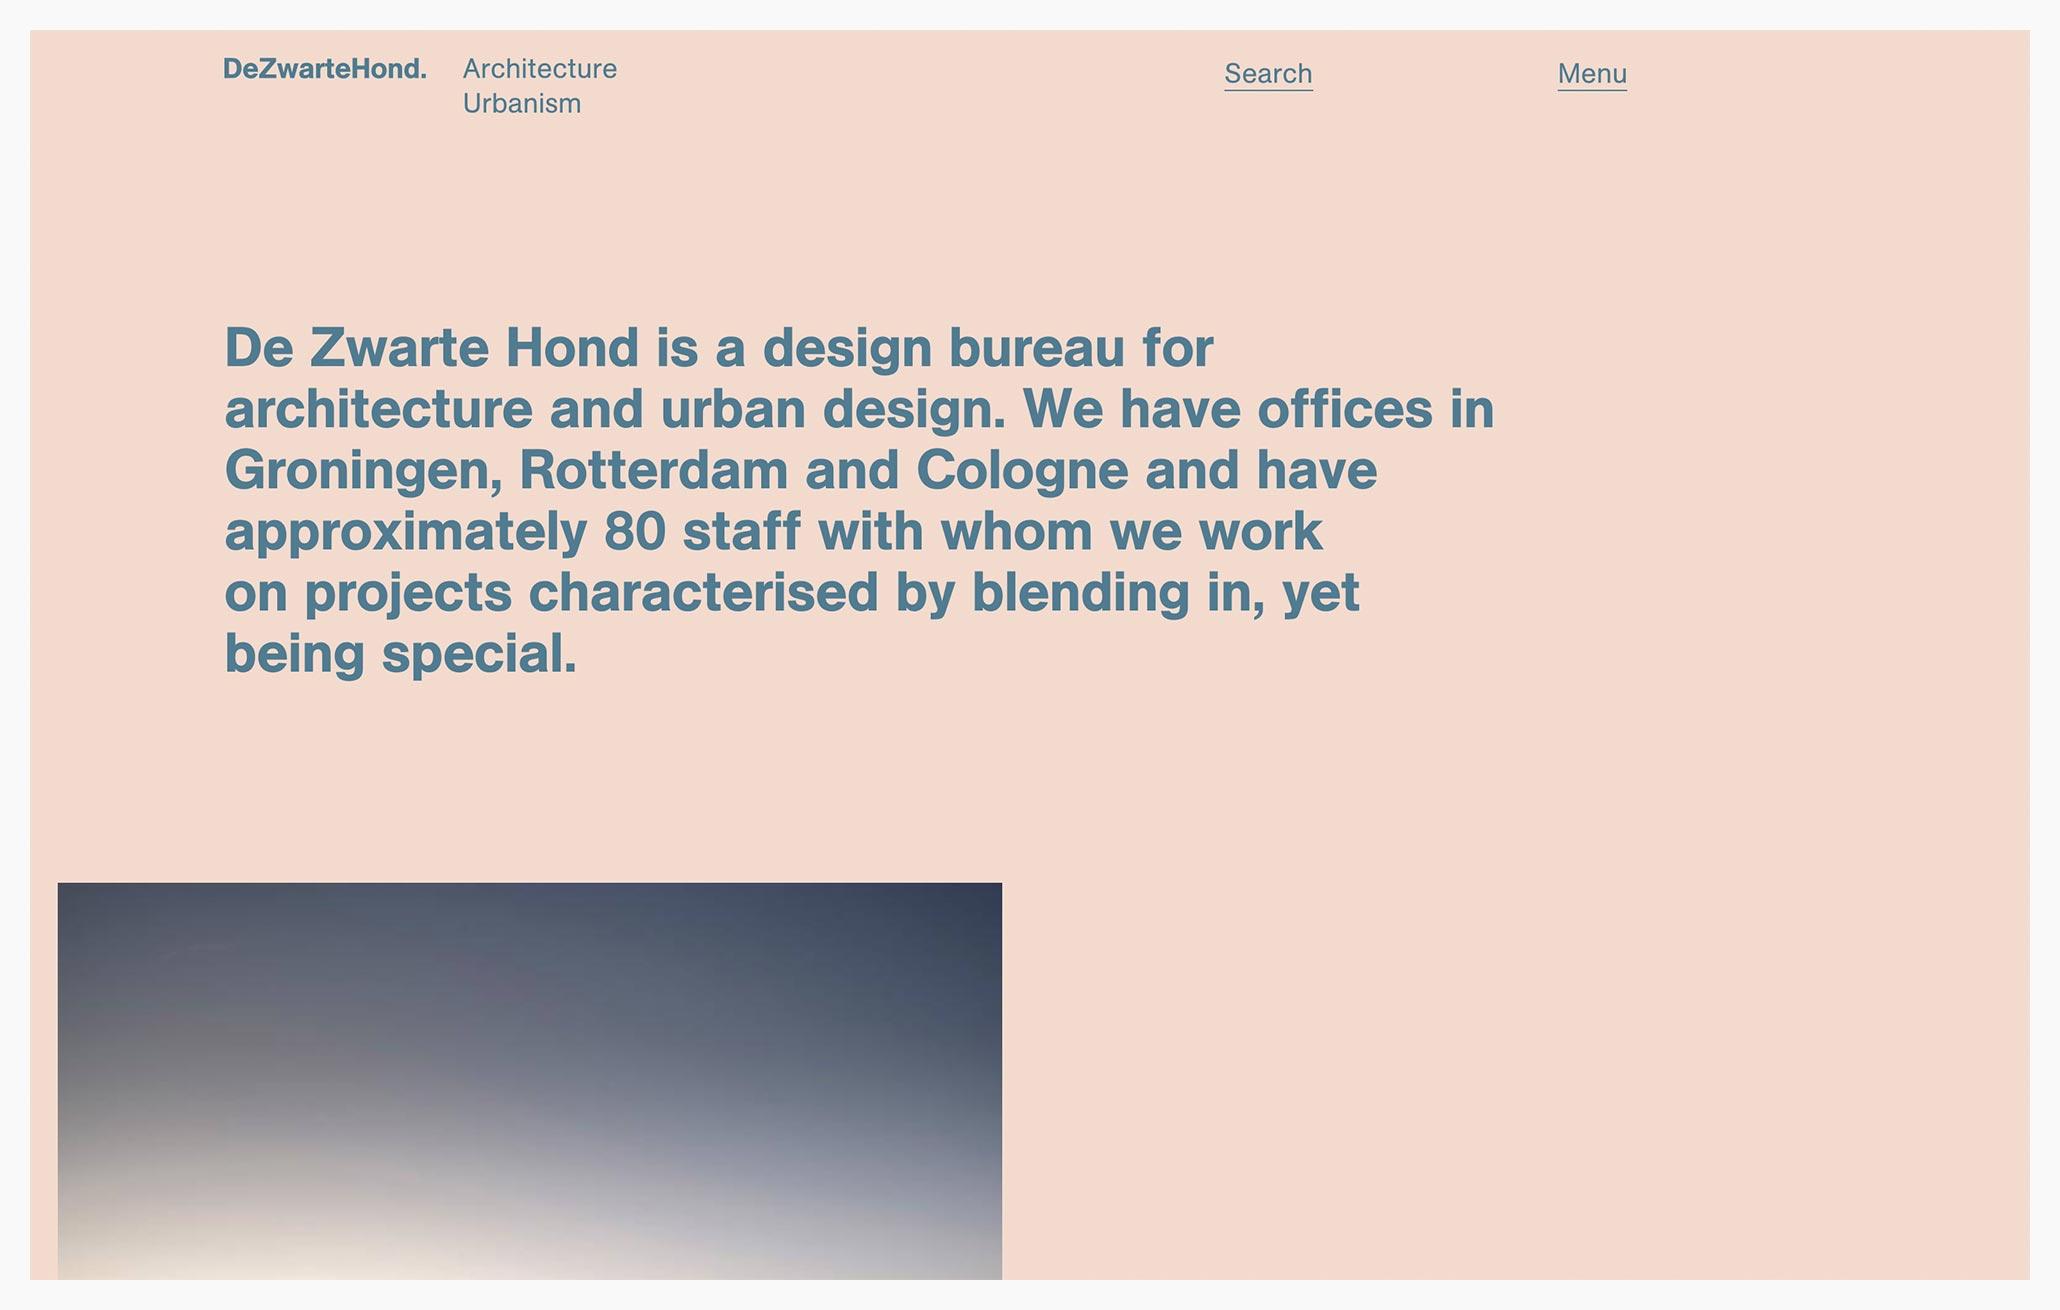 De Zwarte Hond - Best Architecture Website of 2019